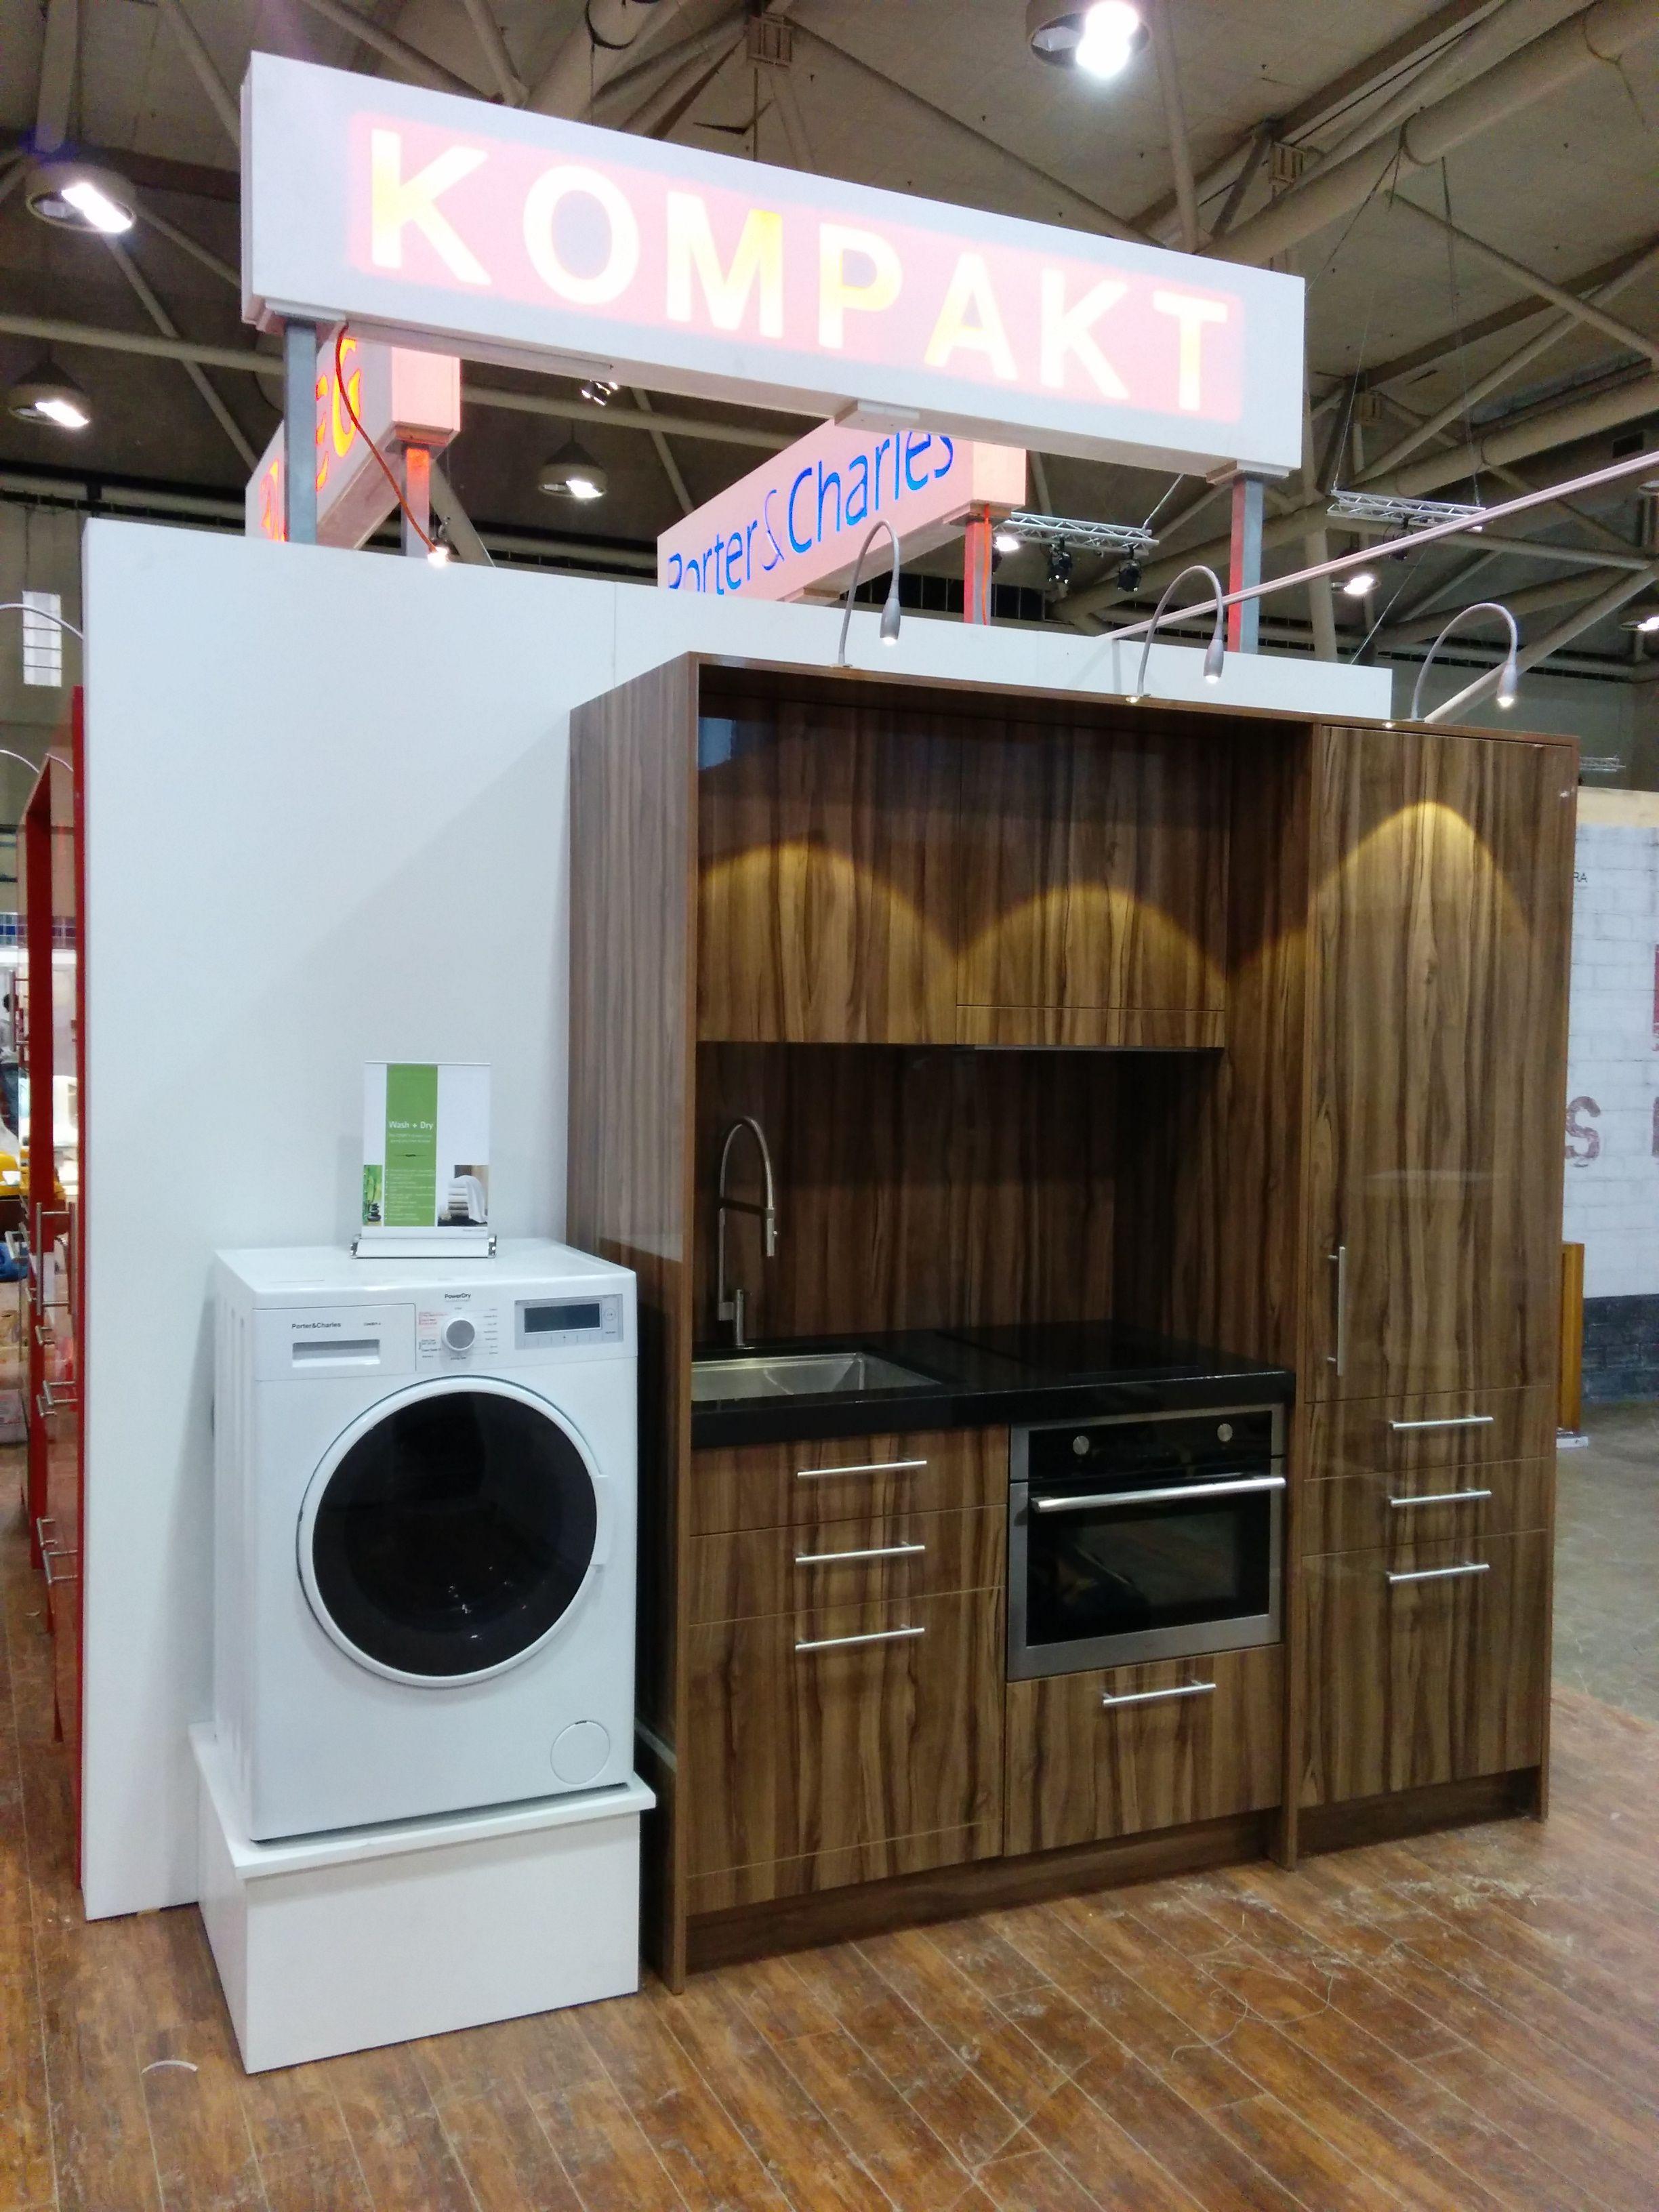 Our Kompakt Kitchen Home Appliances Washing Machine Laundry